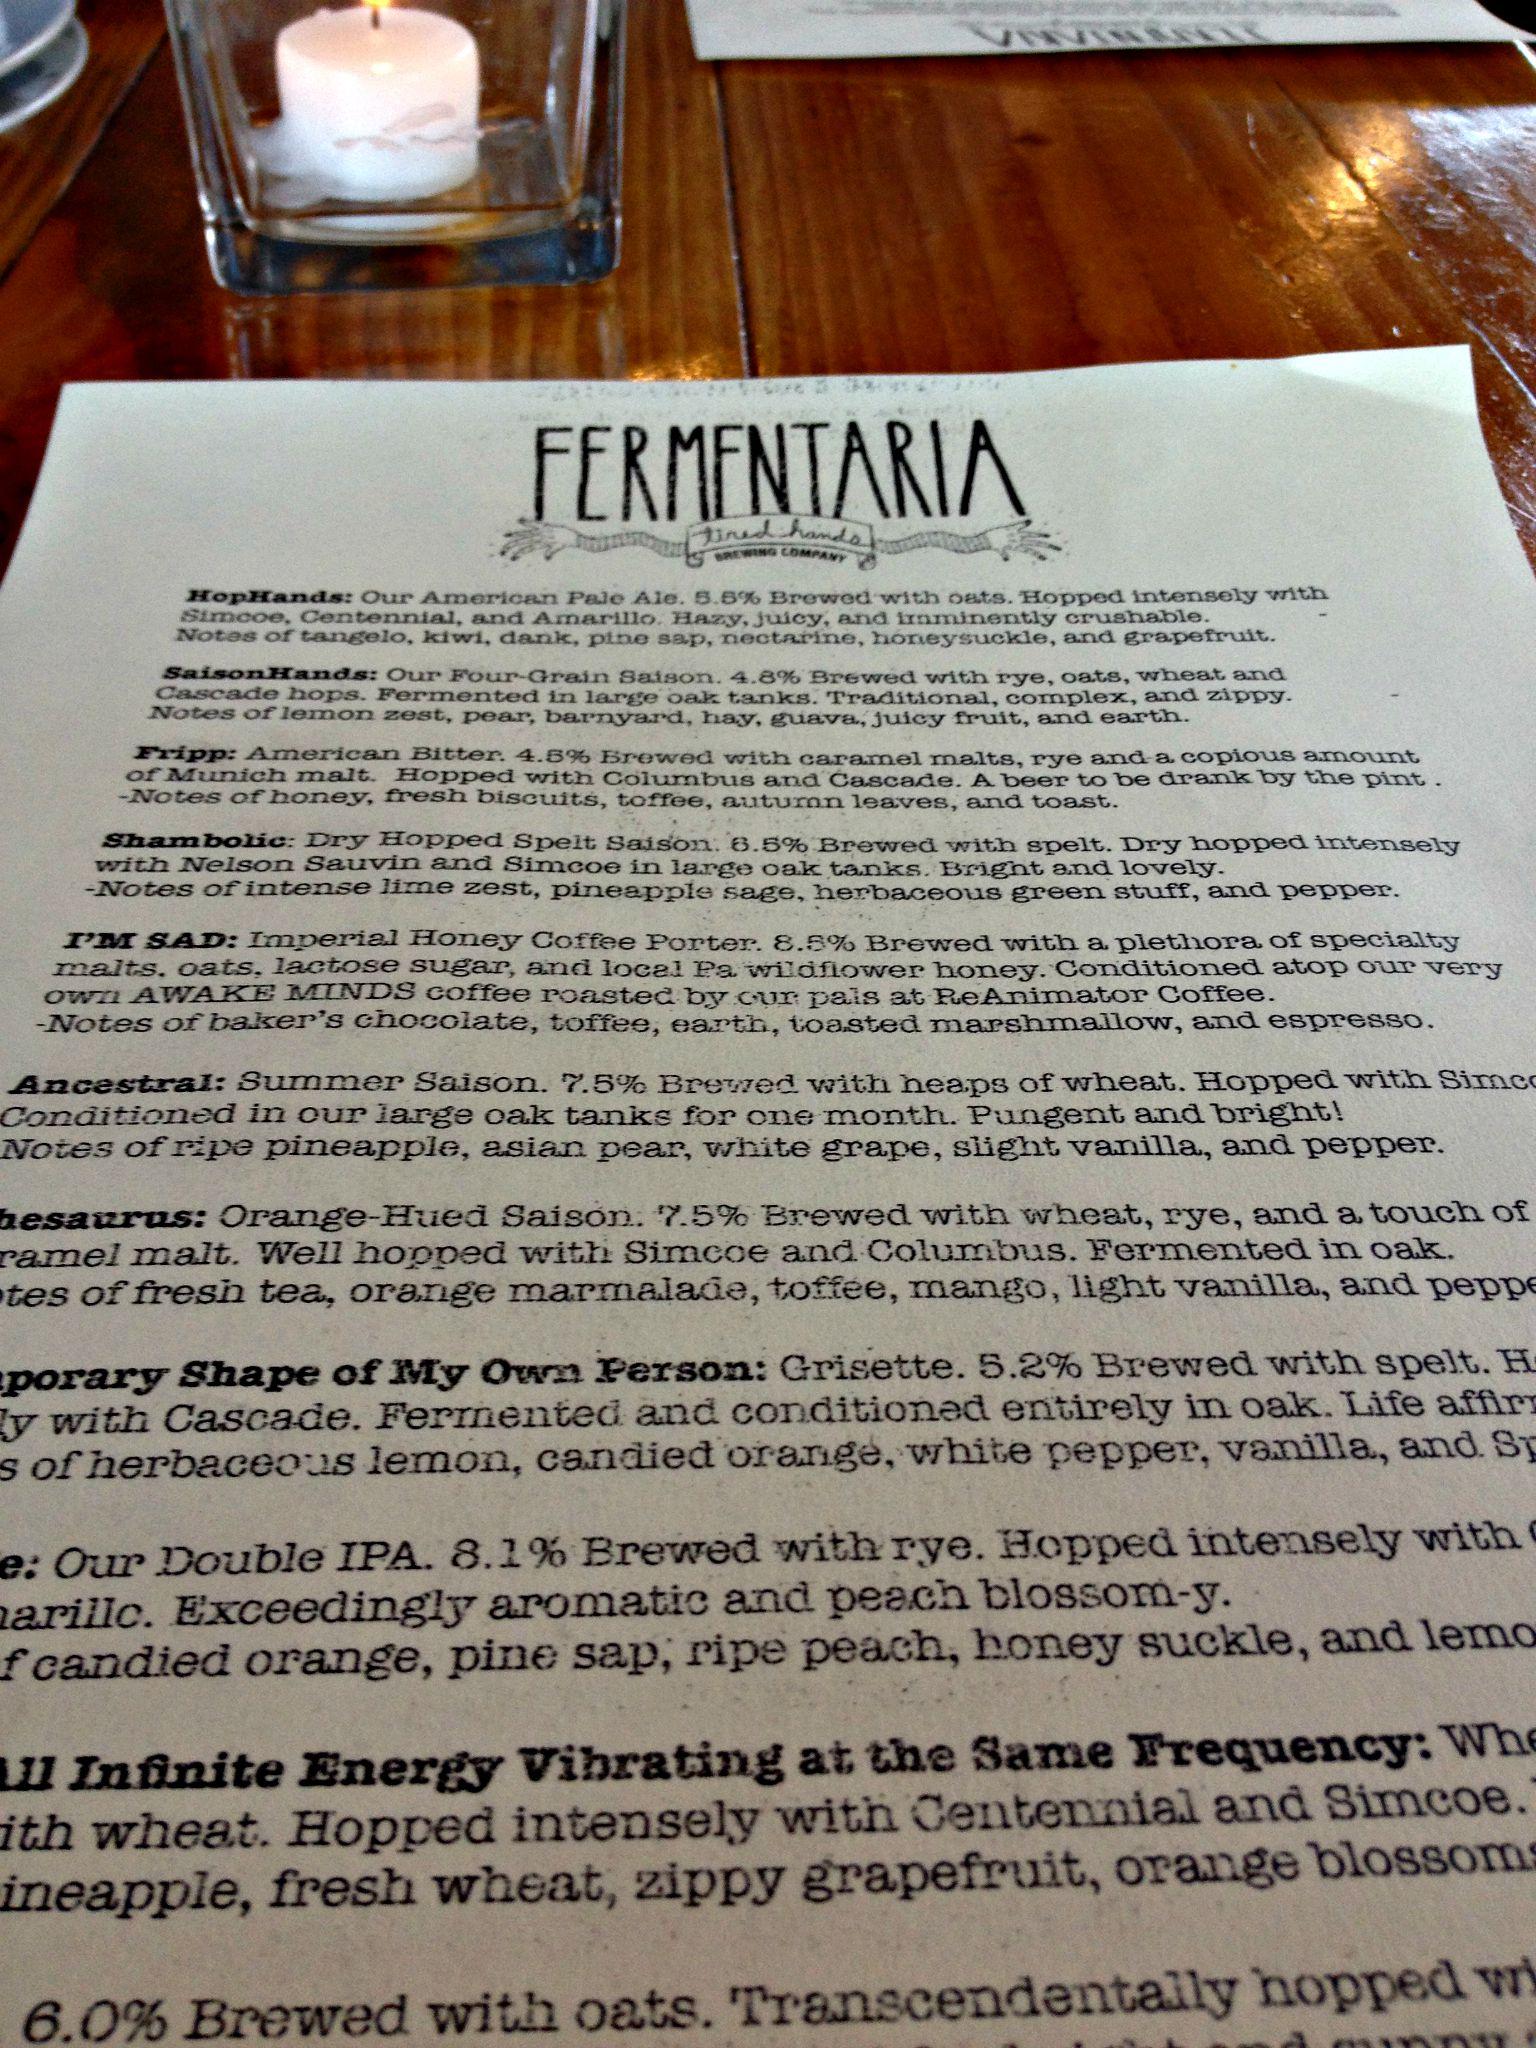 Tired Hands Fermenteria